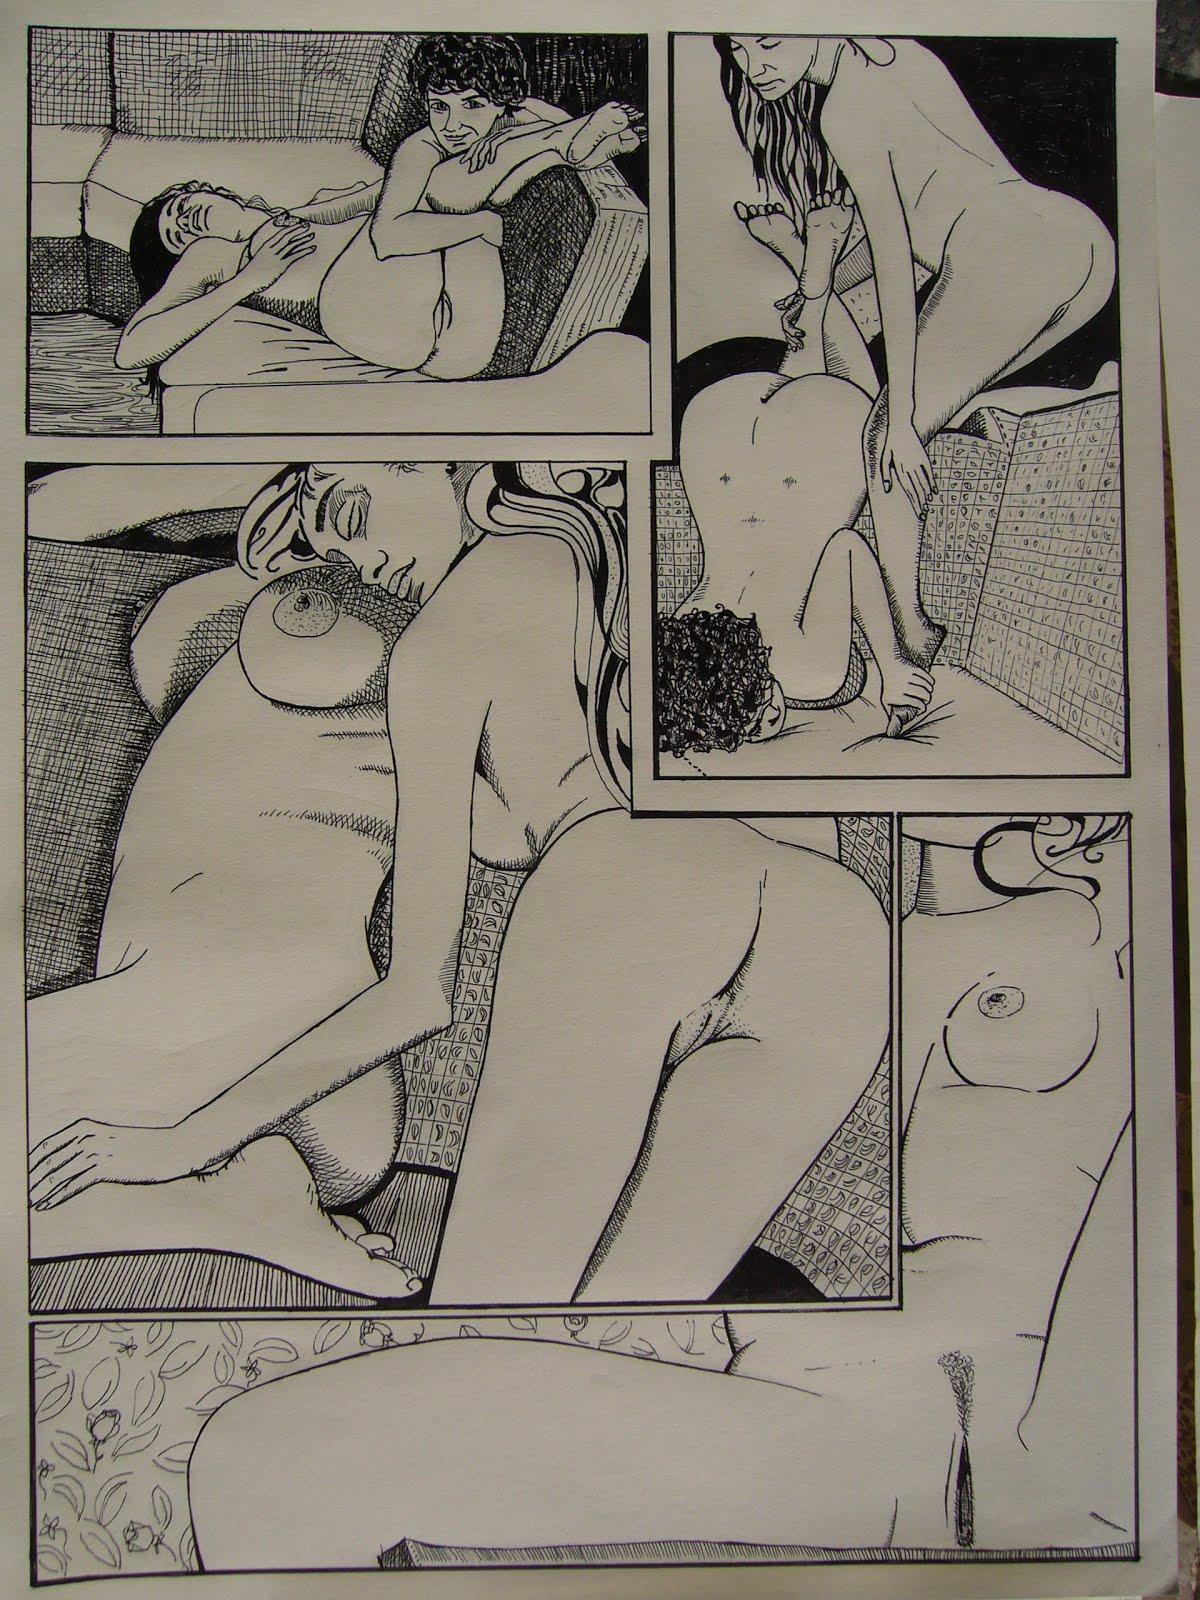 Comic erotico